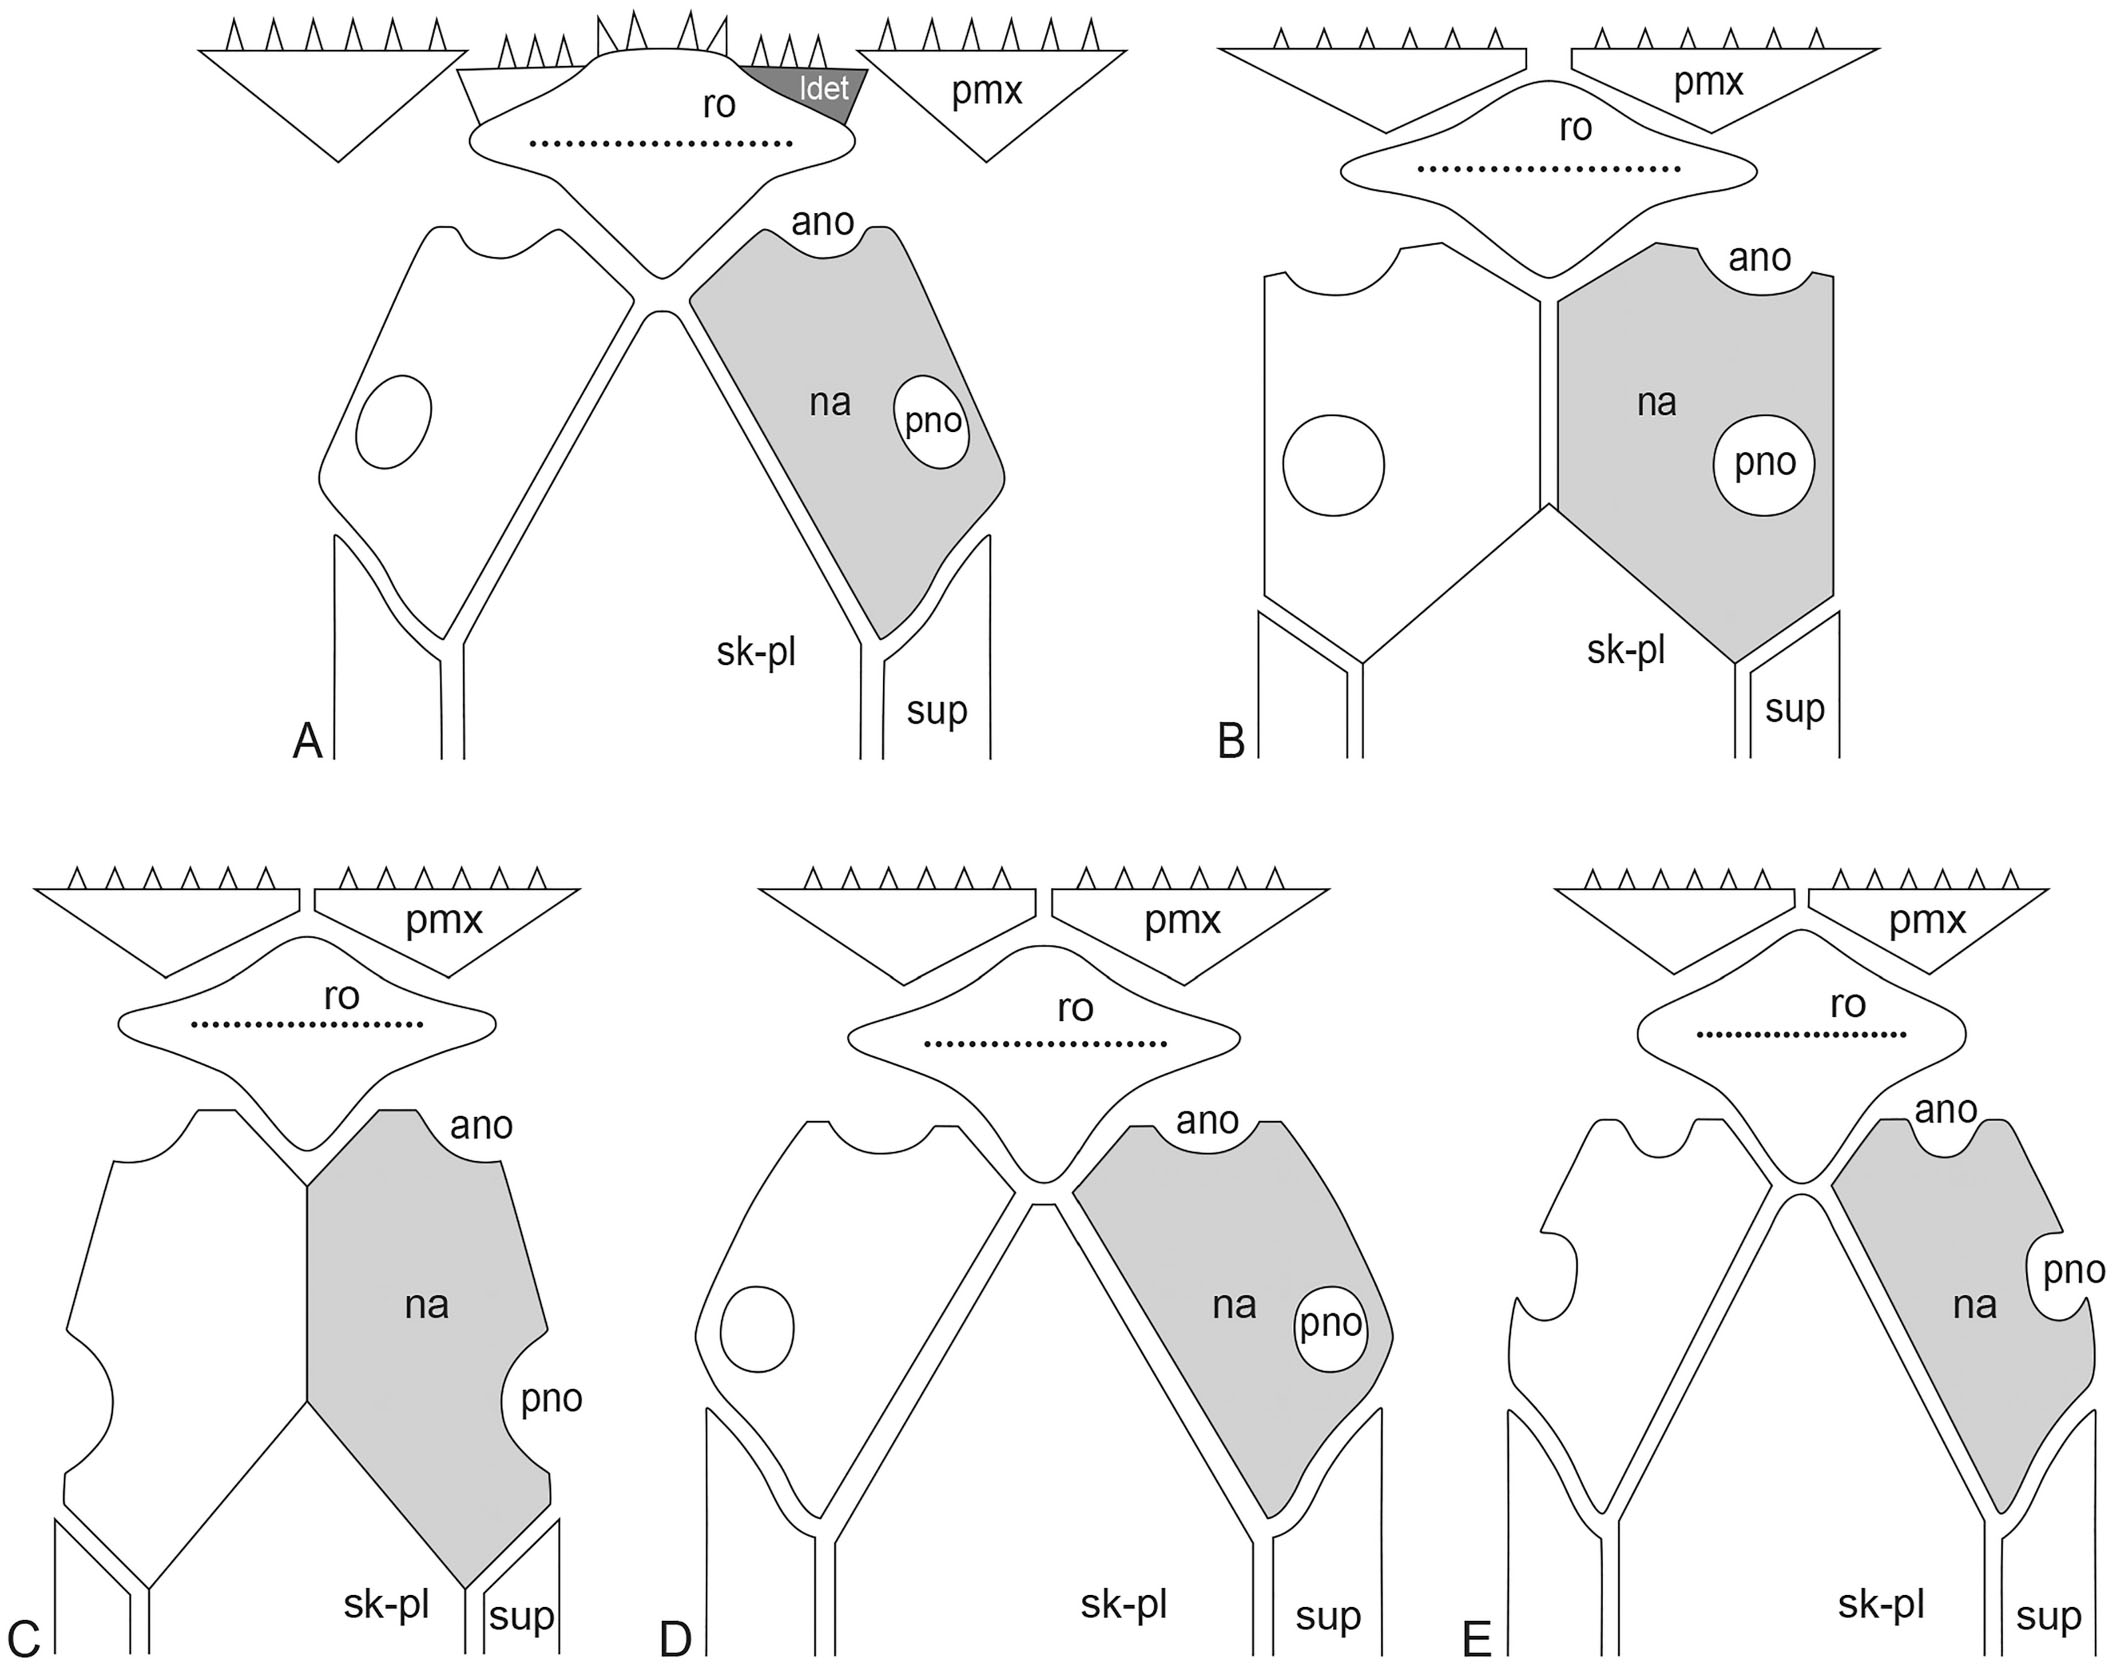 New Triassic Teleosts Actinopterygii Teleosteomorpha